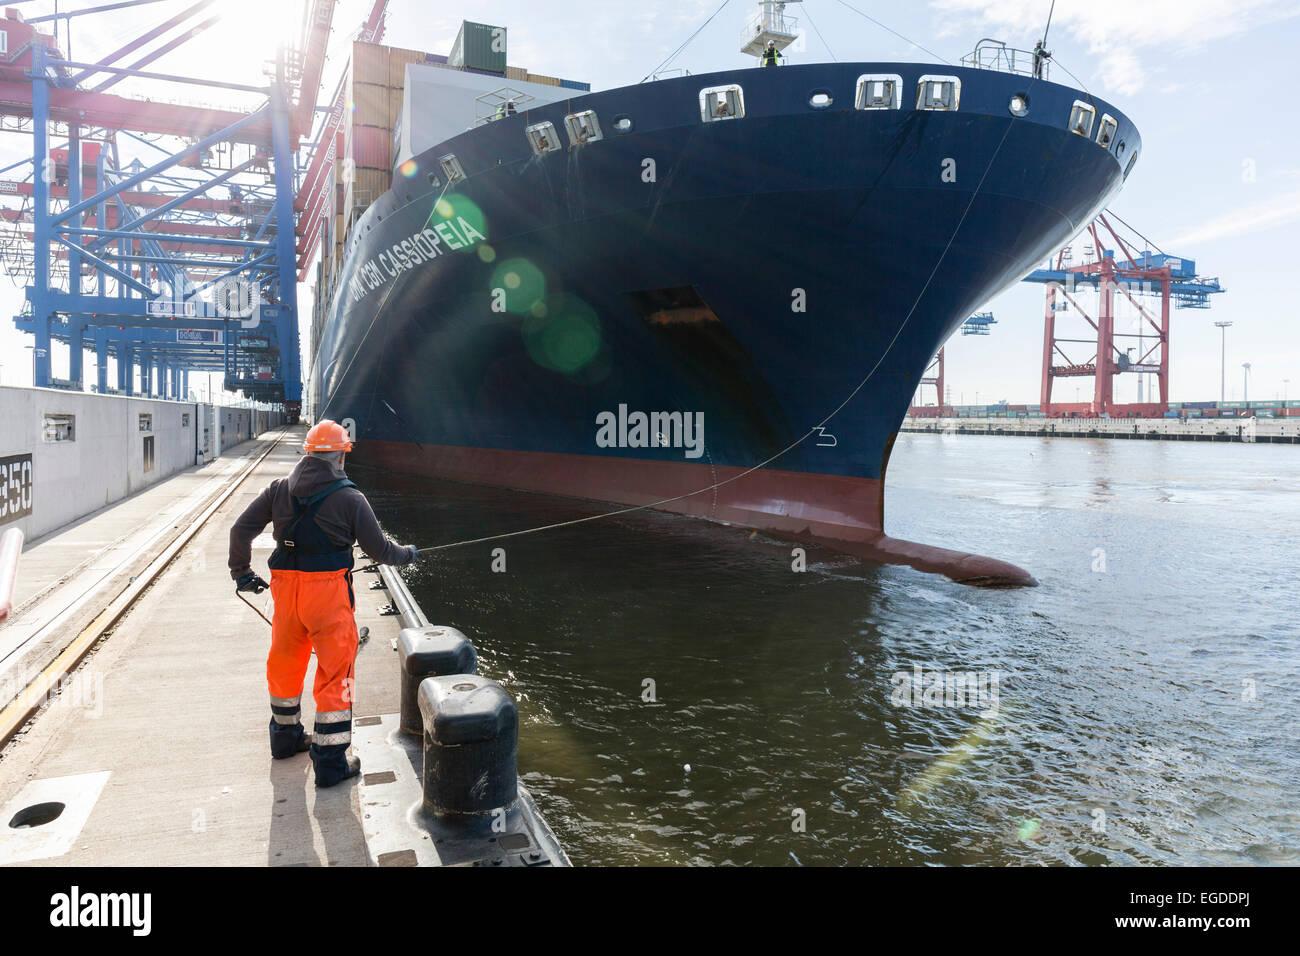 Worker fixed the mooring line of CMA CGM Cassiopeia in Hamburg, Burchardkai, Hamburg, Germany - Stock Image